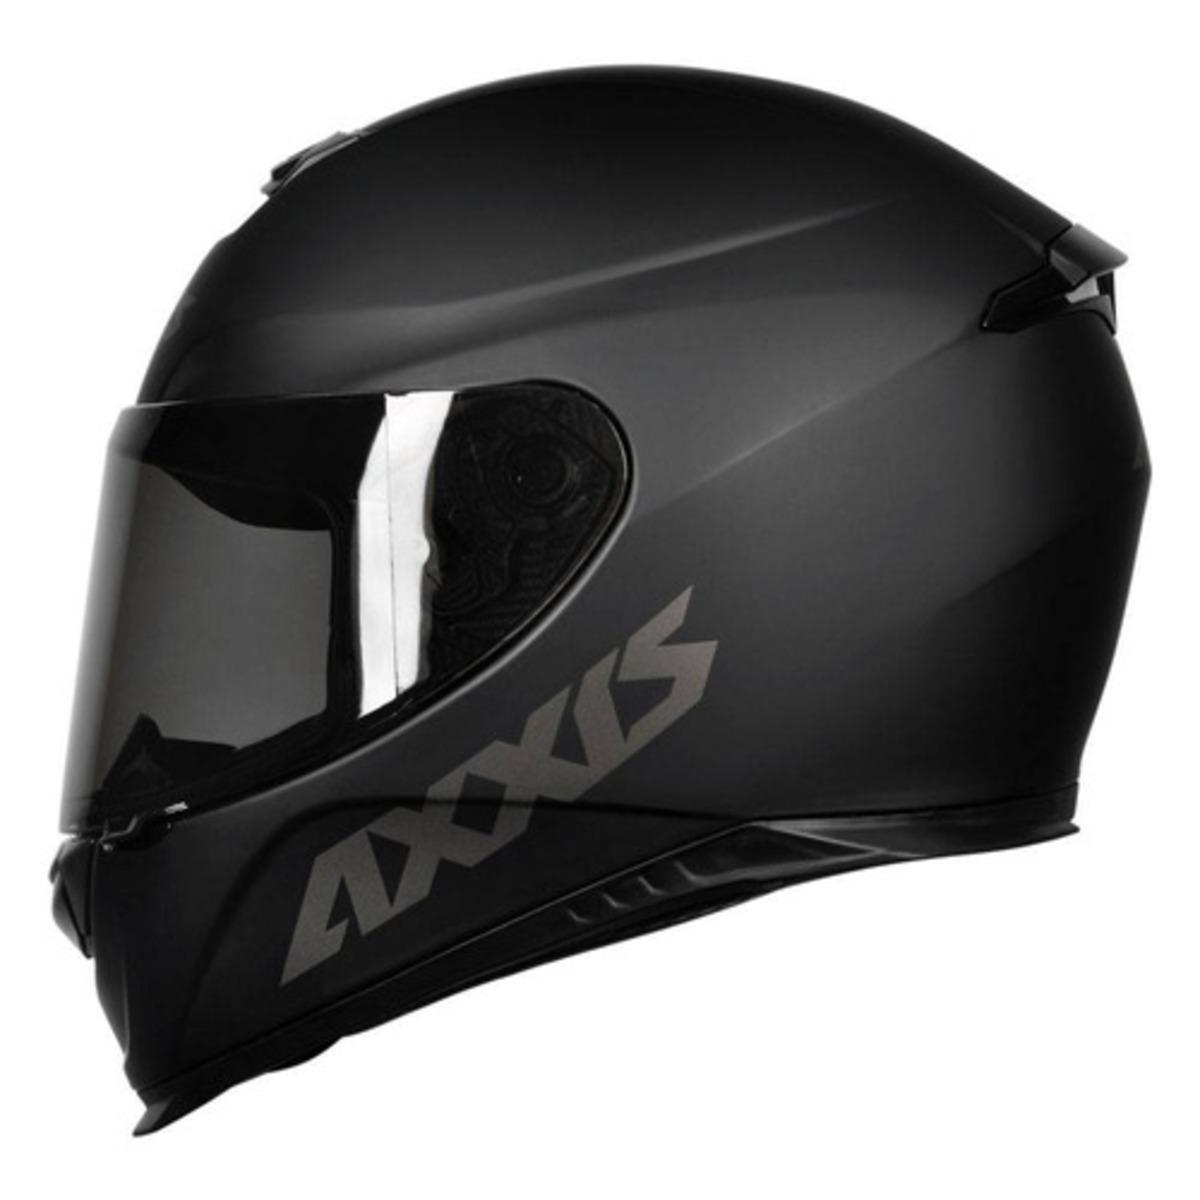 CAPACETE AXXIS EAGLE SOLID MONOCOLOR MATTE BLACK/GREY 56/S